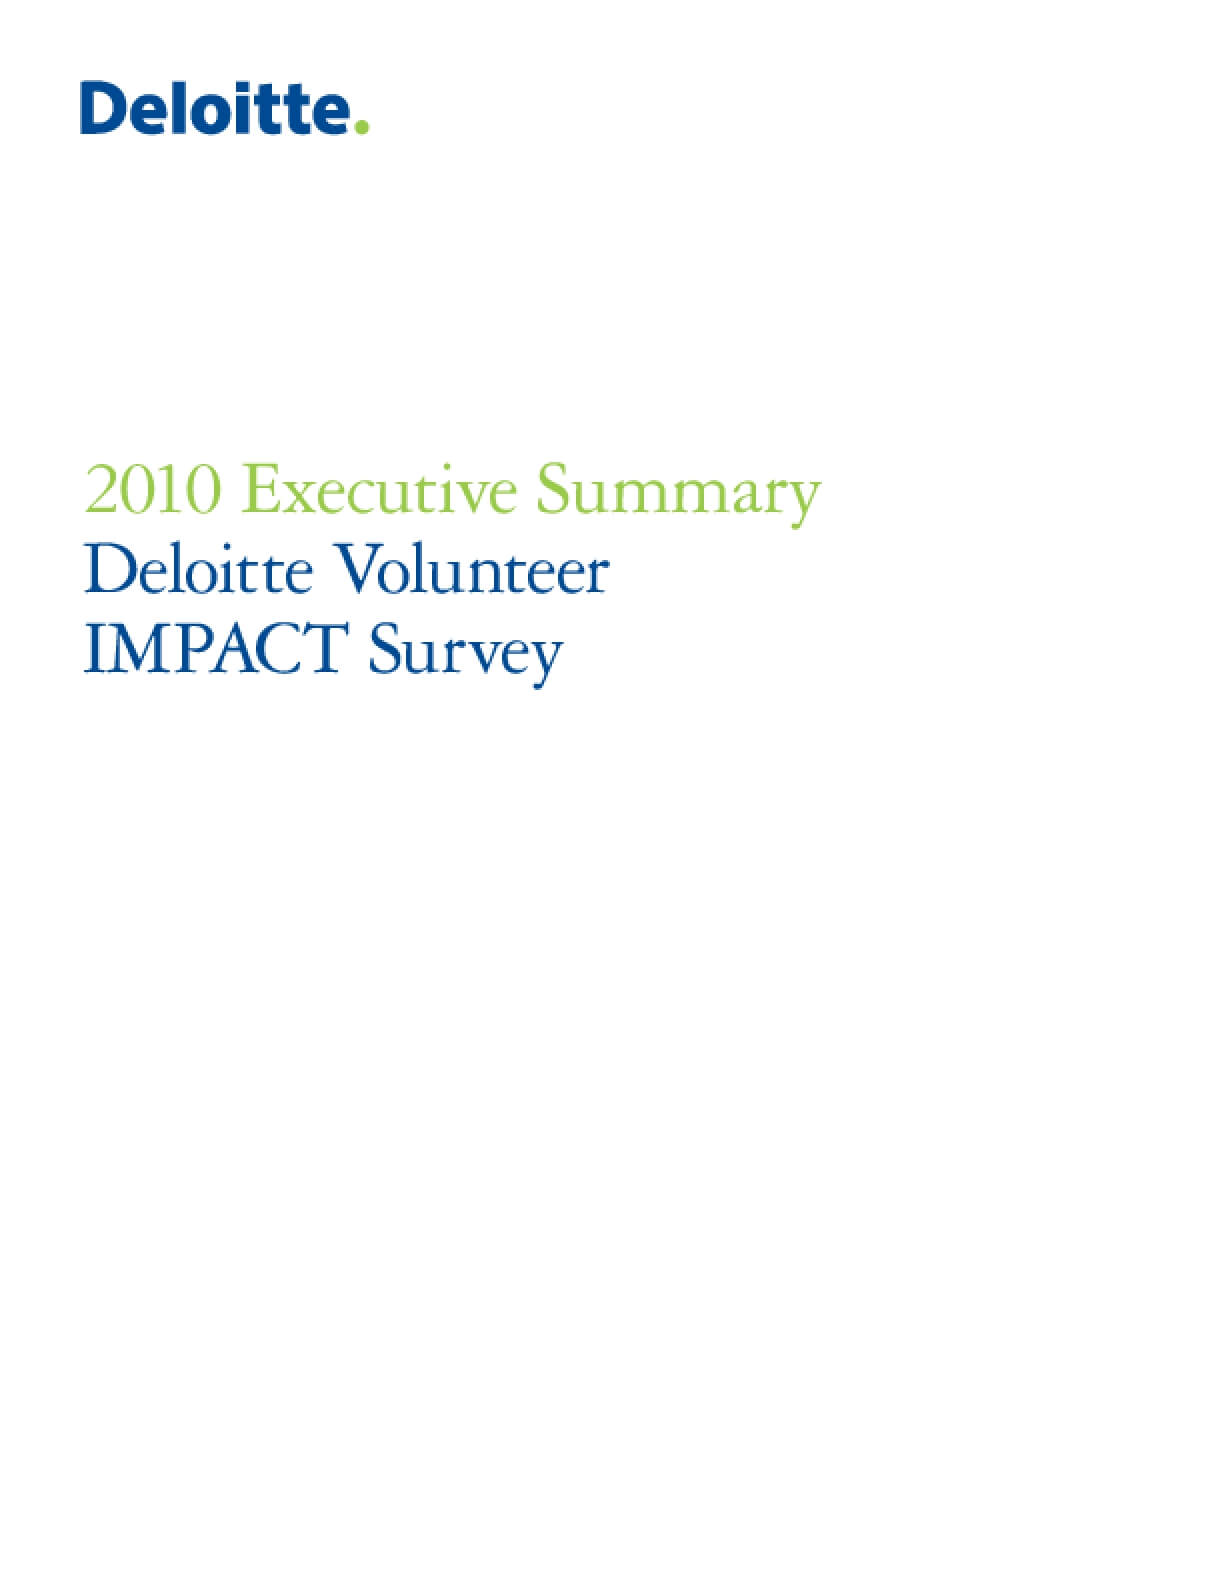 2010 Executive Summary: Deloitte Volunteer IMPACT Survey